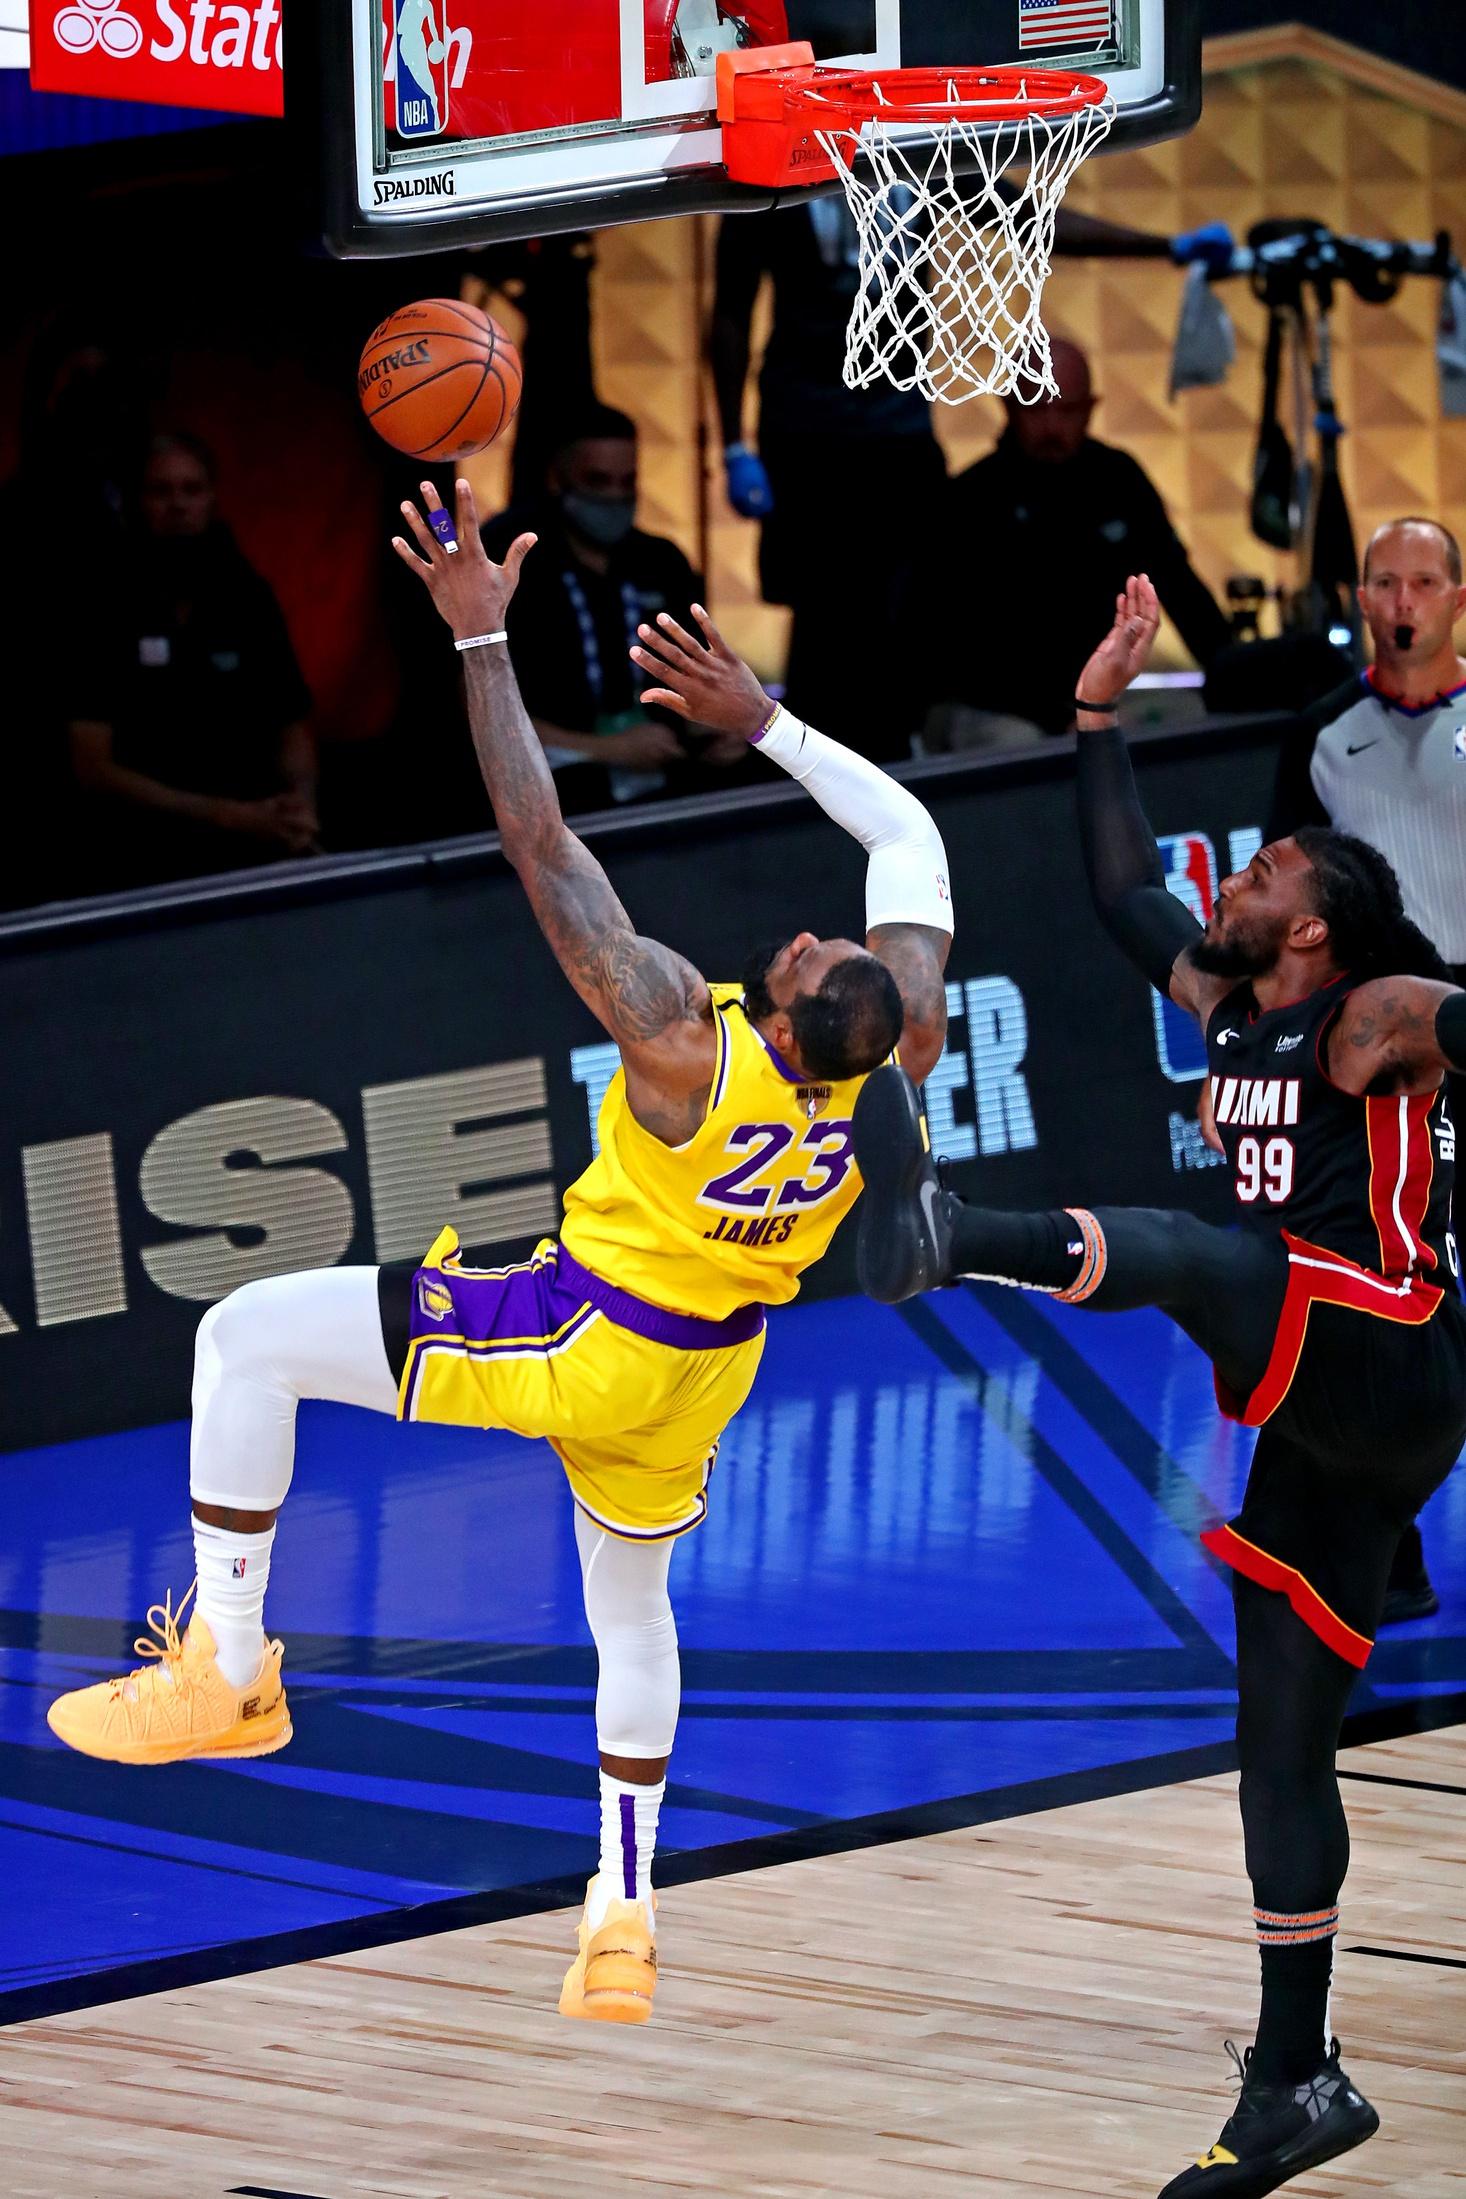 NBA Finals Game 4 Fantasy Stud: LeBron James